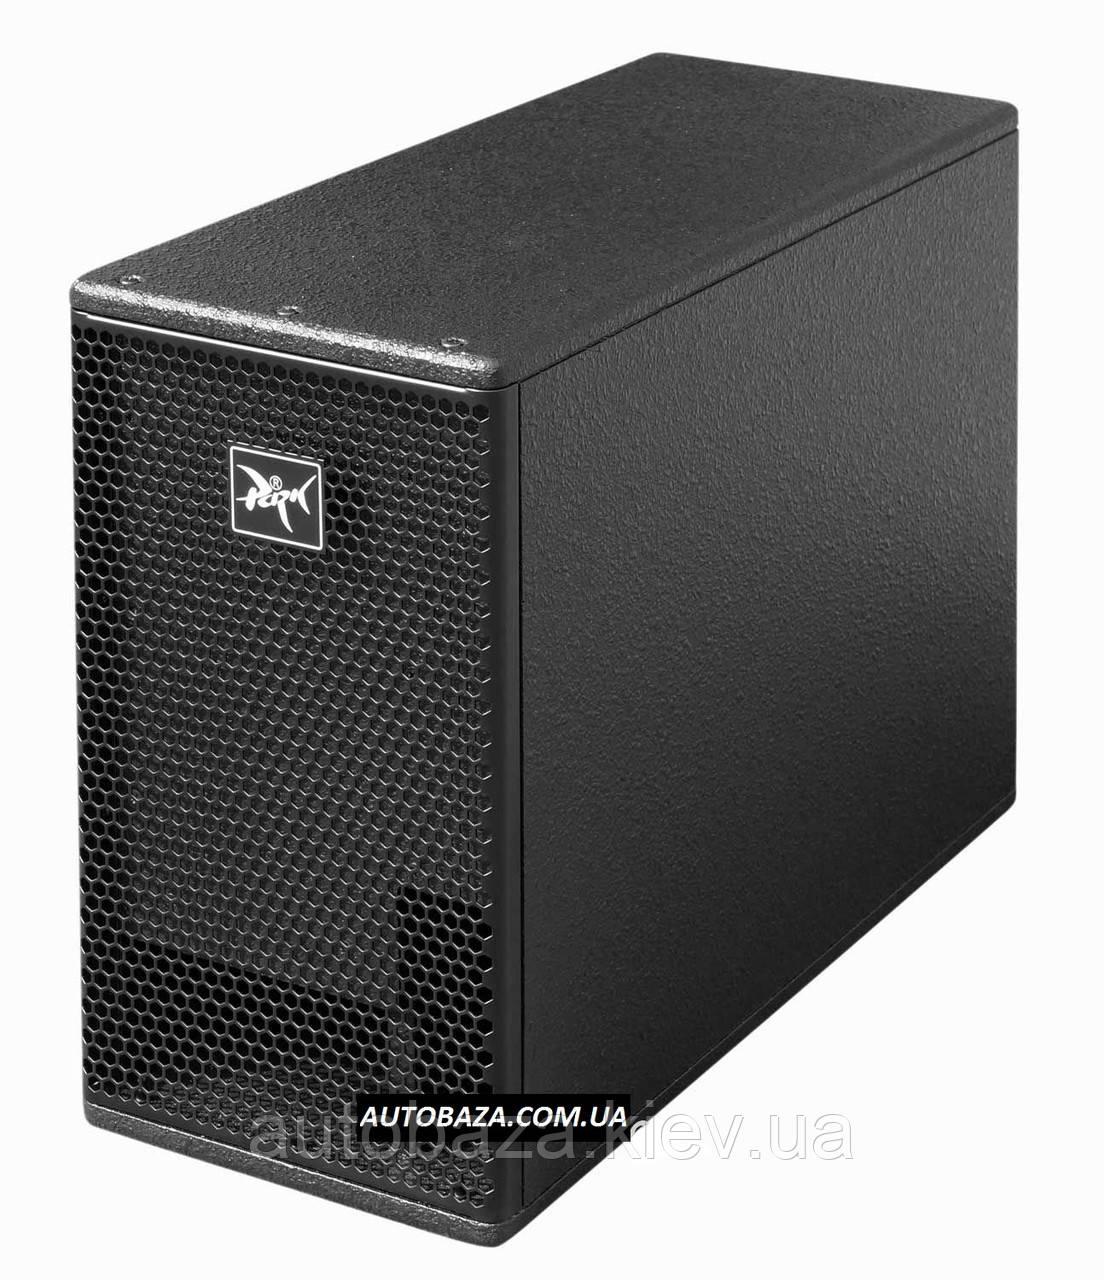 Park Audio NW2110-P Активный сабвуфер 300 Вт / Paint Warnex